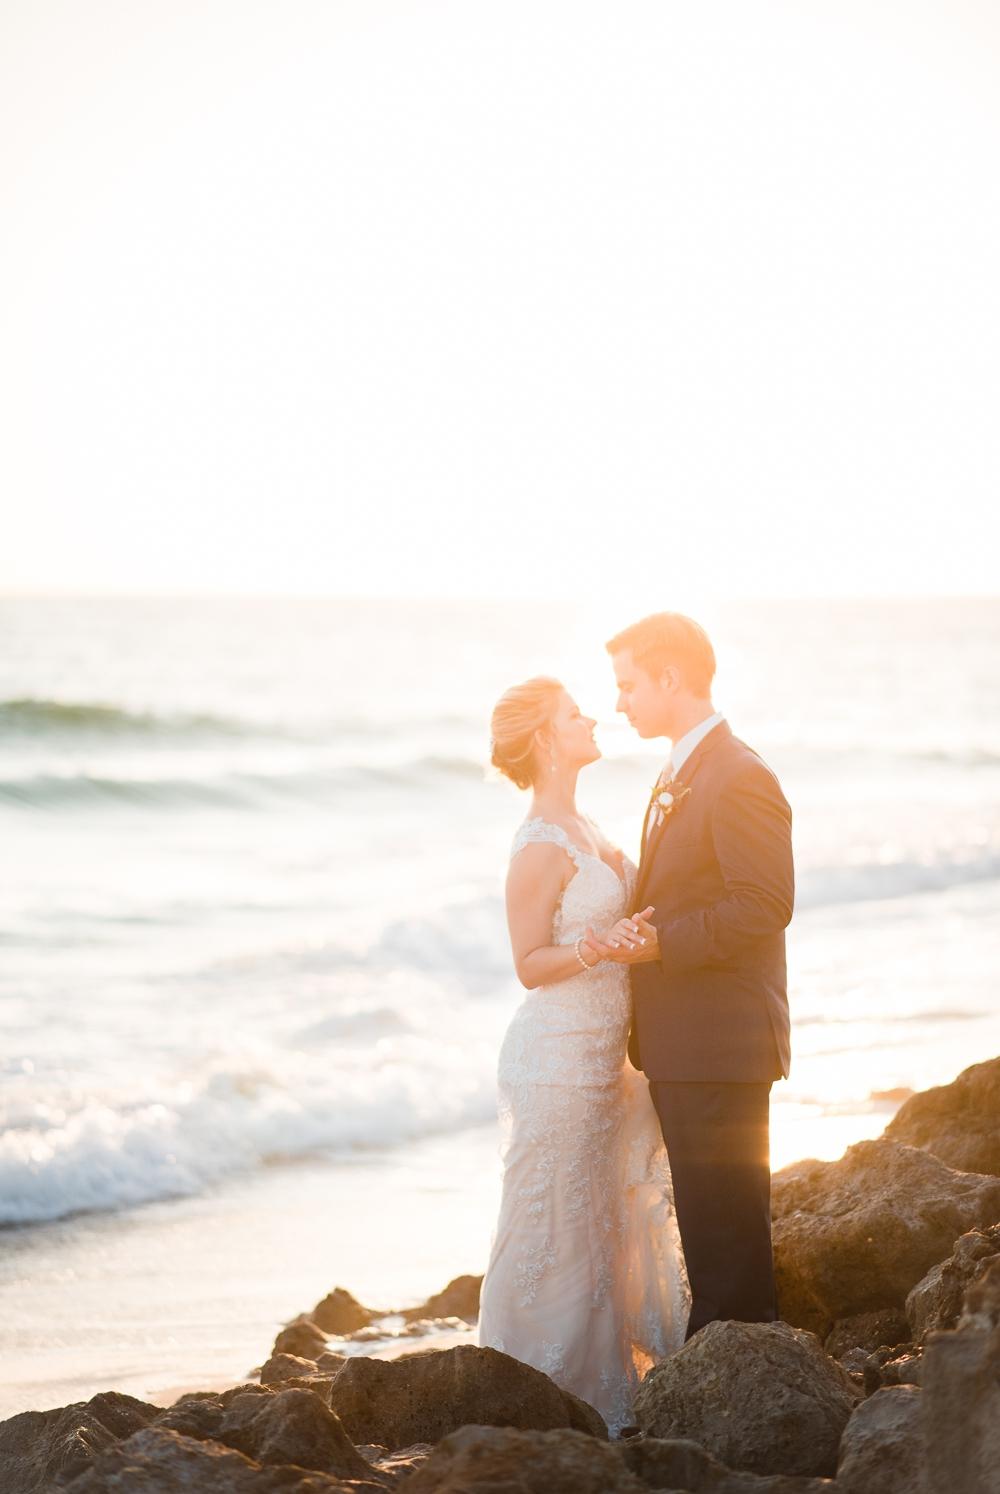 2016 HLM Wedding Beach Shoot 17.jpg